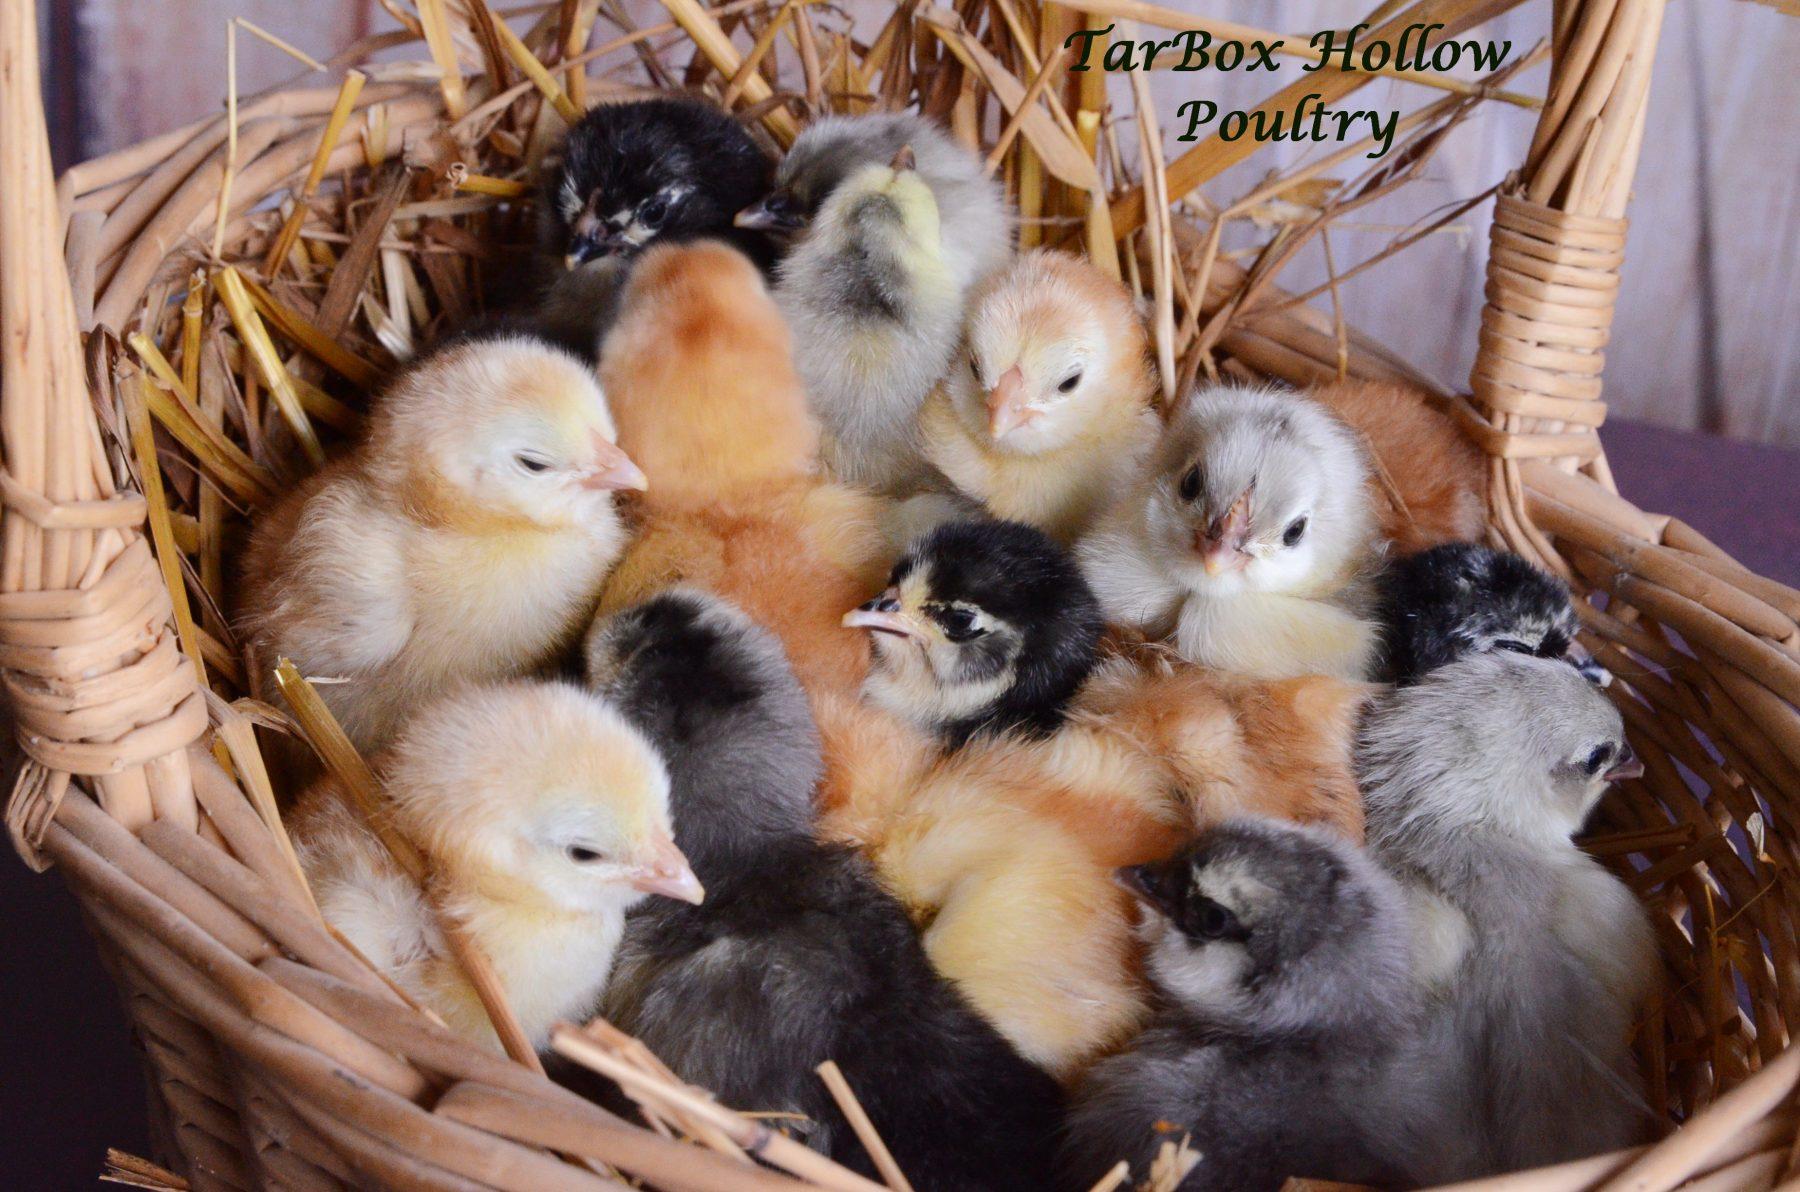 Buying Chicks